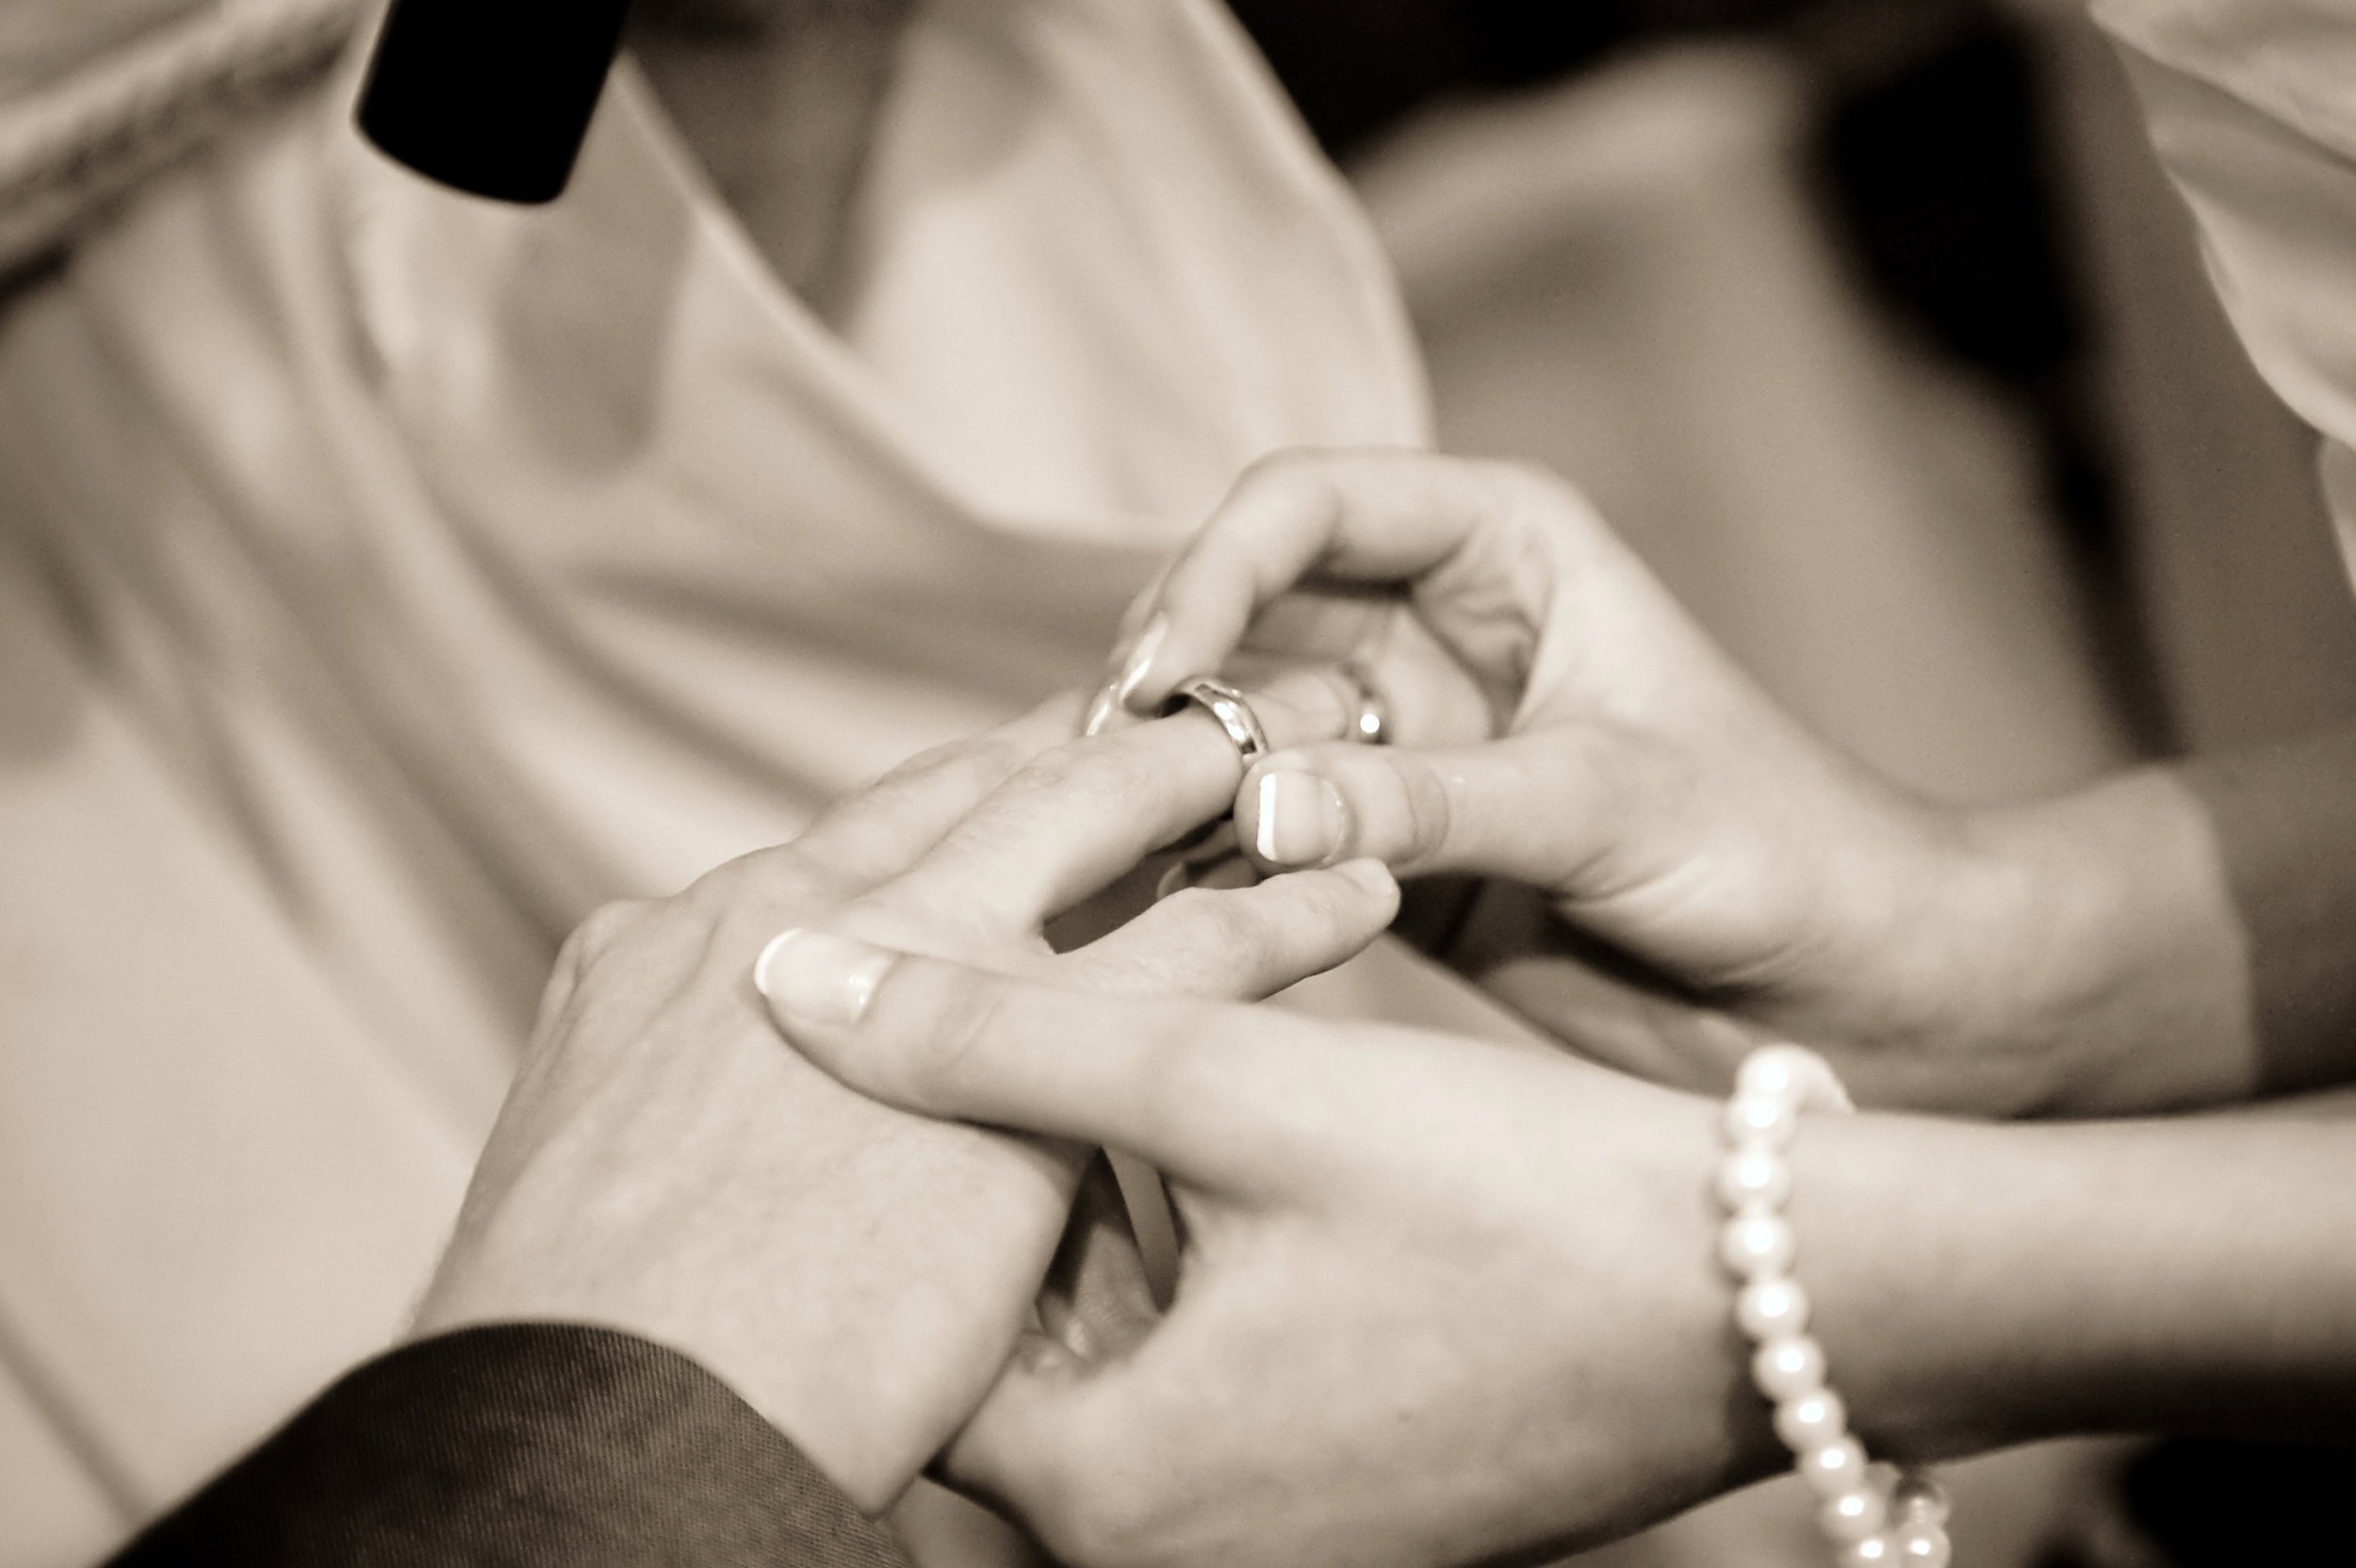 wedding-wedding-ring-53585.jpeg